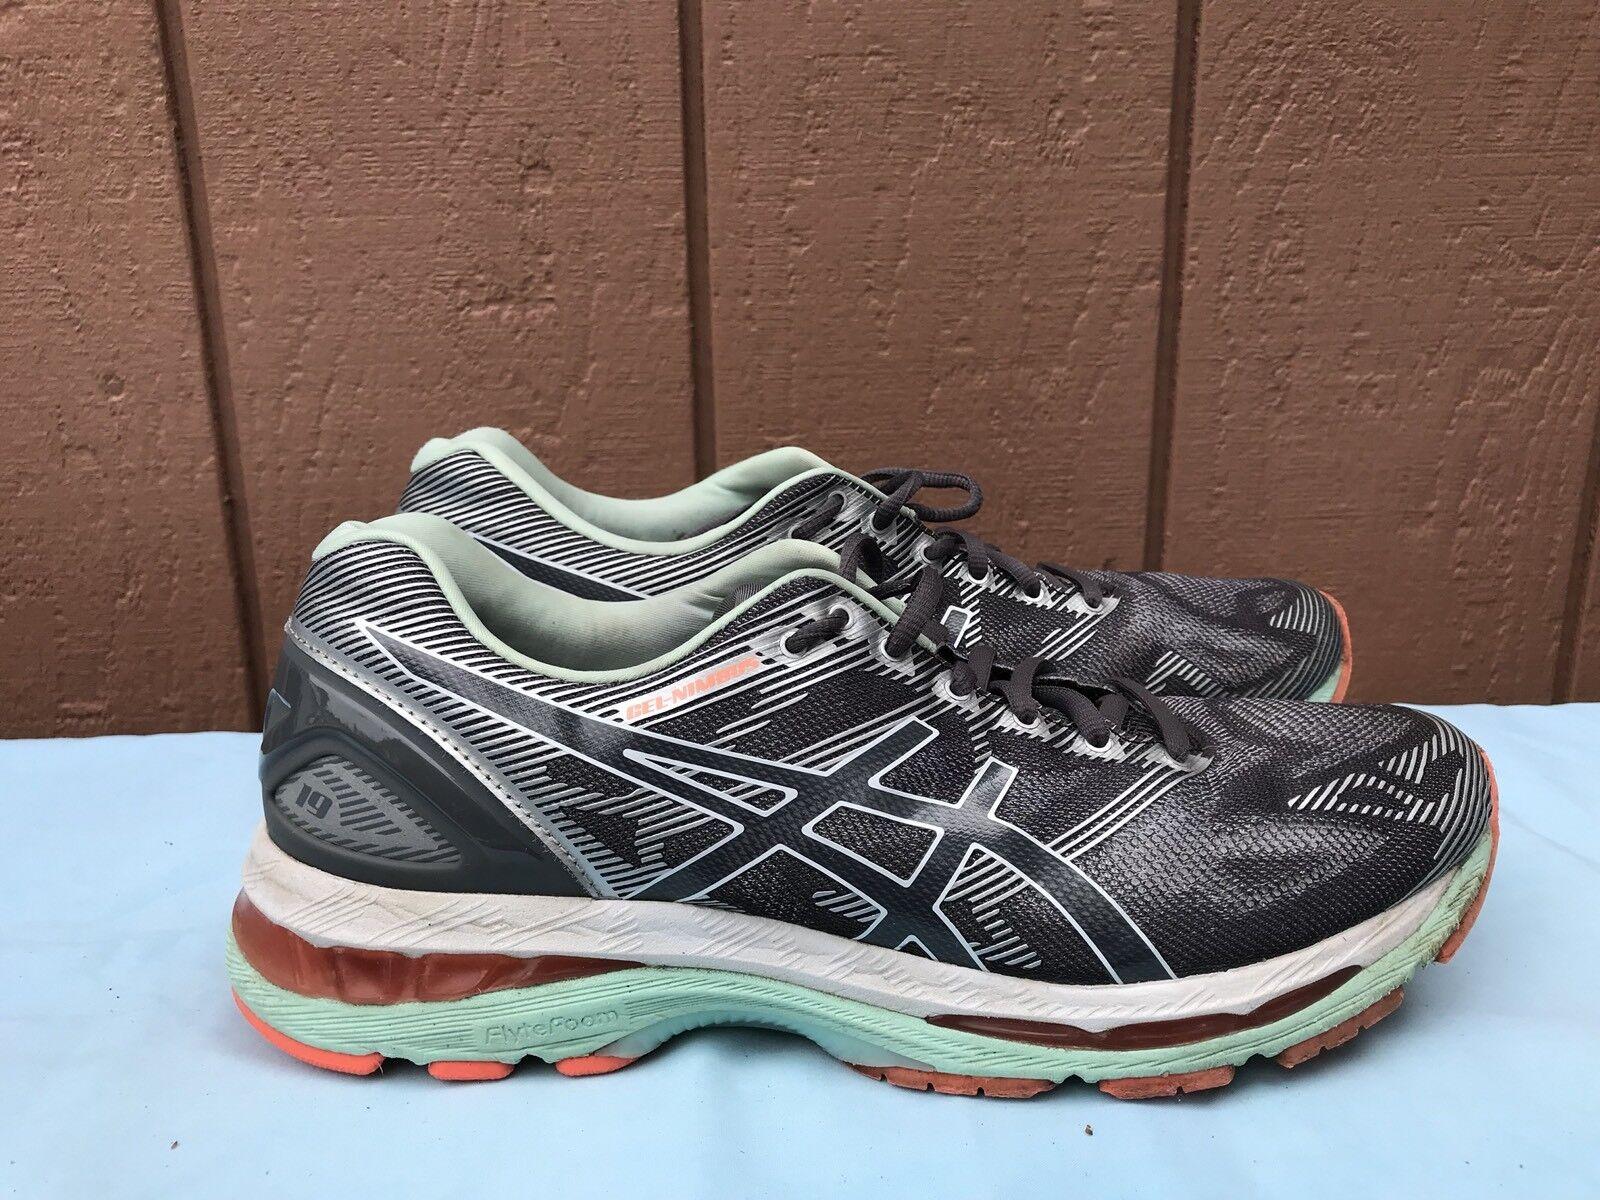 Women's Asics GEL-Nimbus 19 US 11 Running Shoe Carbon/White/Flash Coral T750N A5